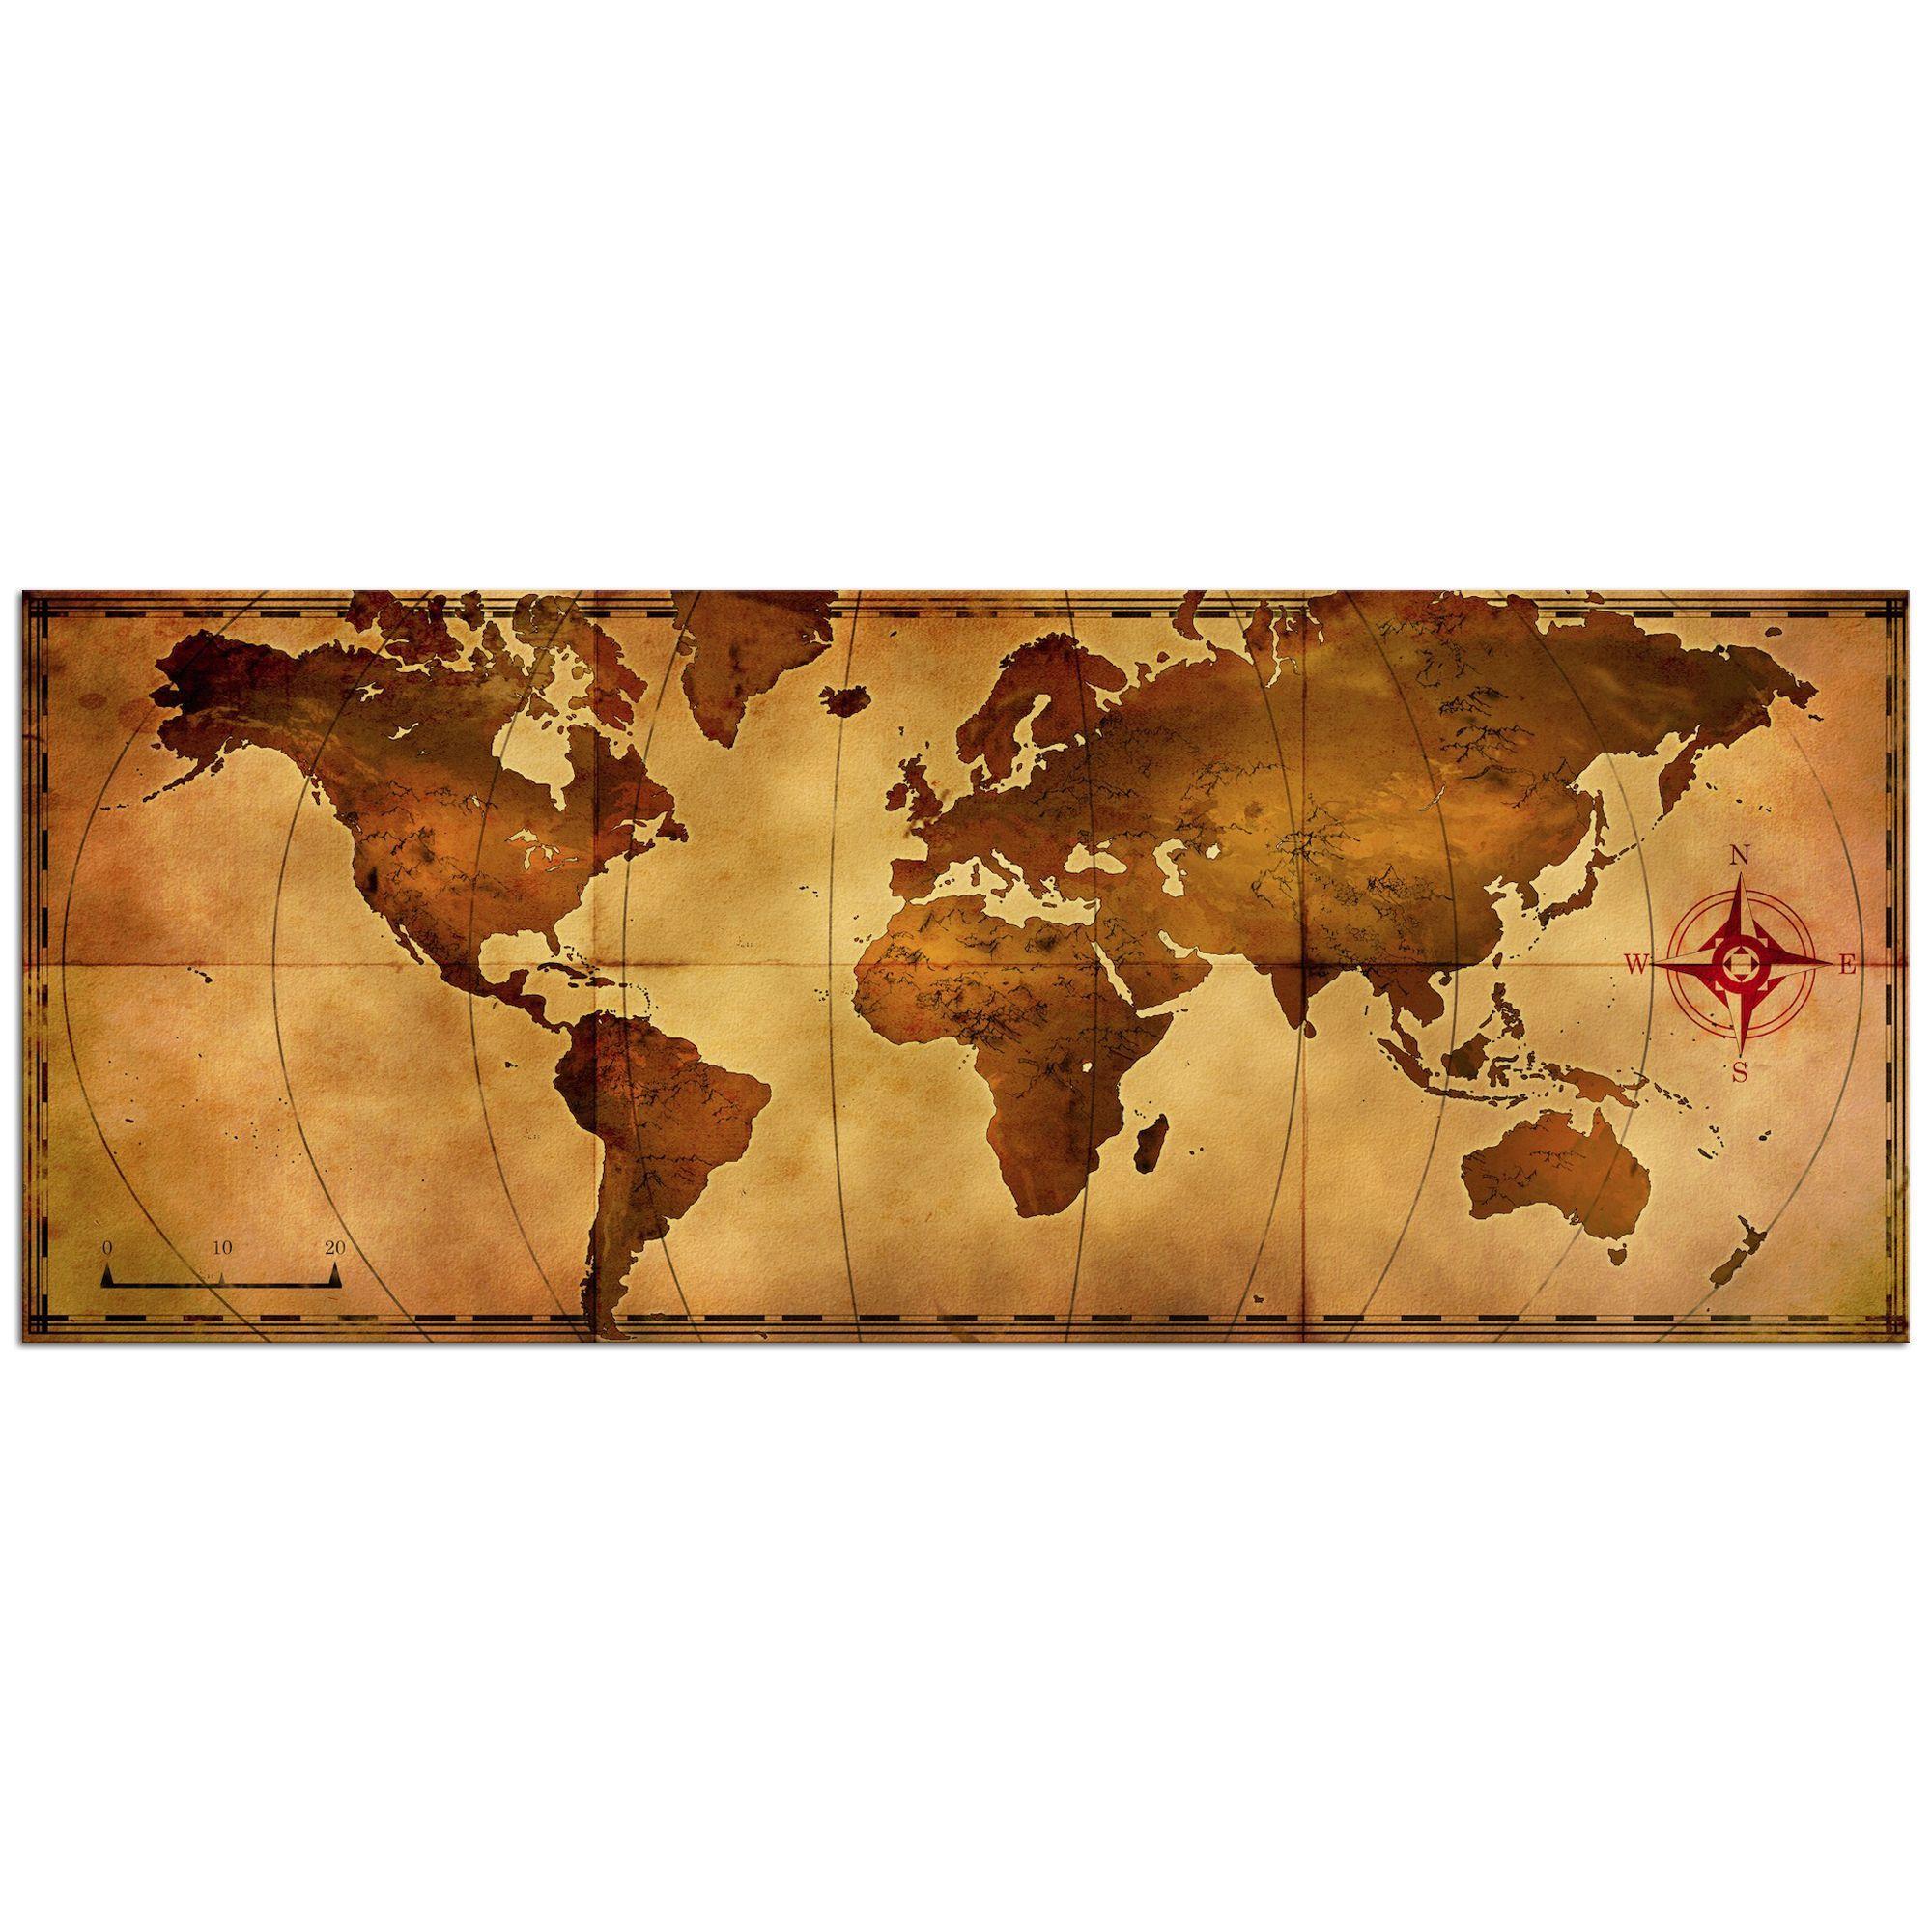 Alan rodriguez uold world mapu large rustic world map metal wall art